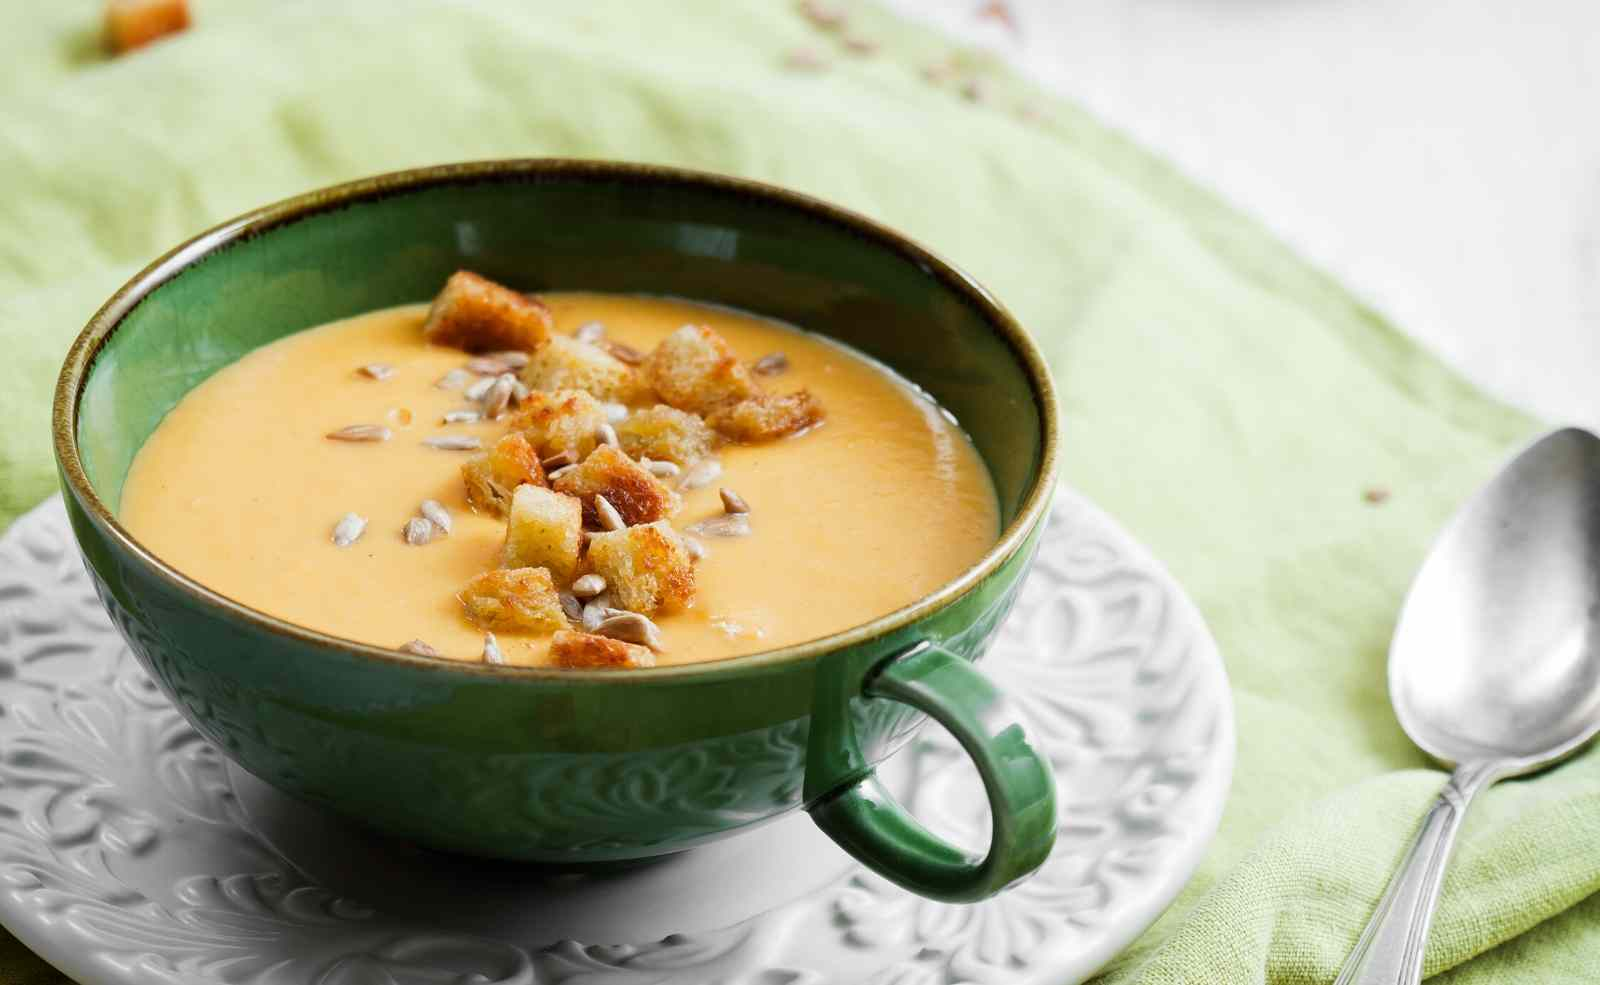 suesskartoffel suppe